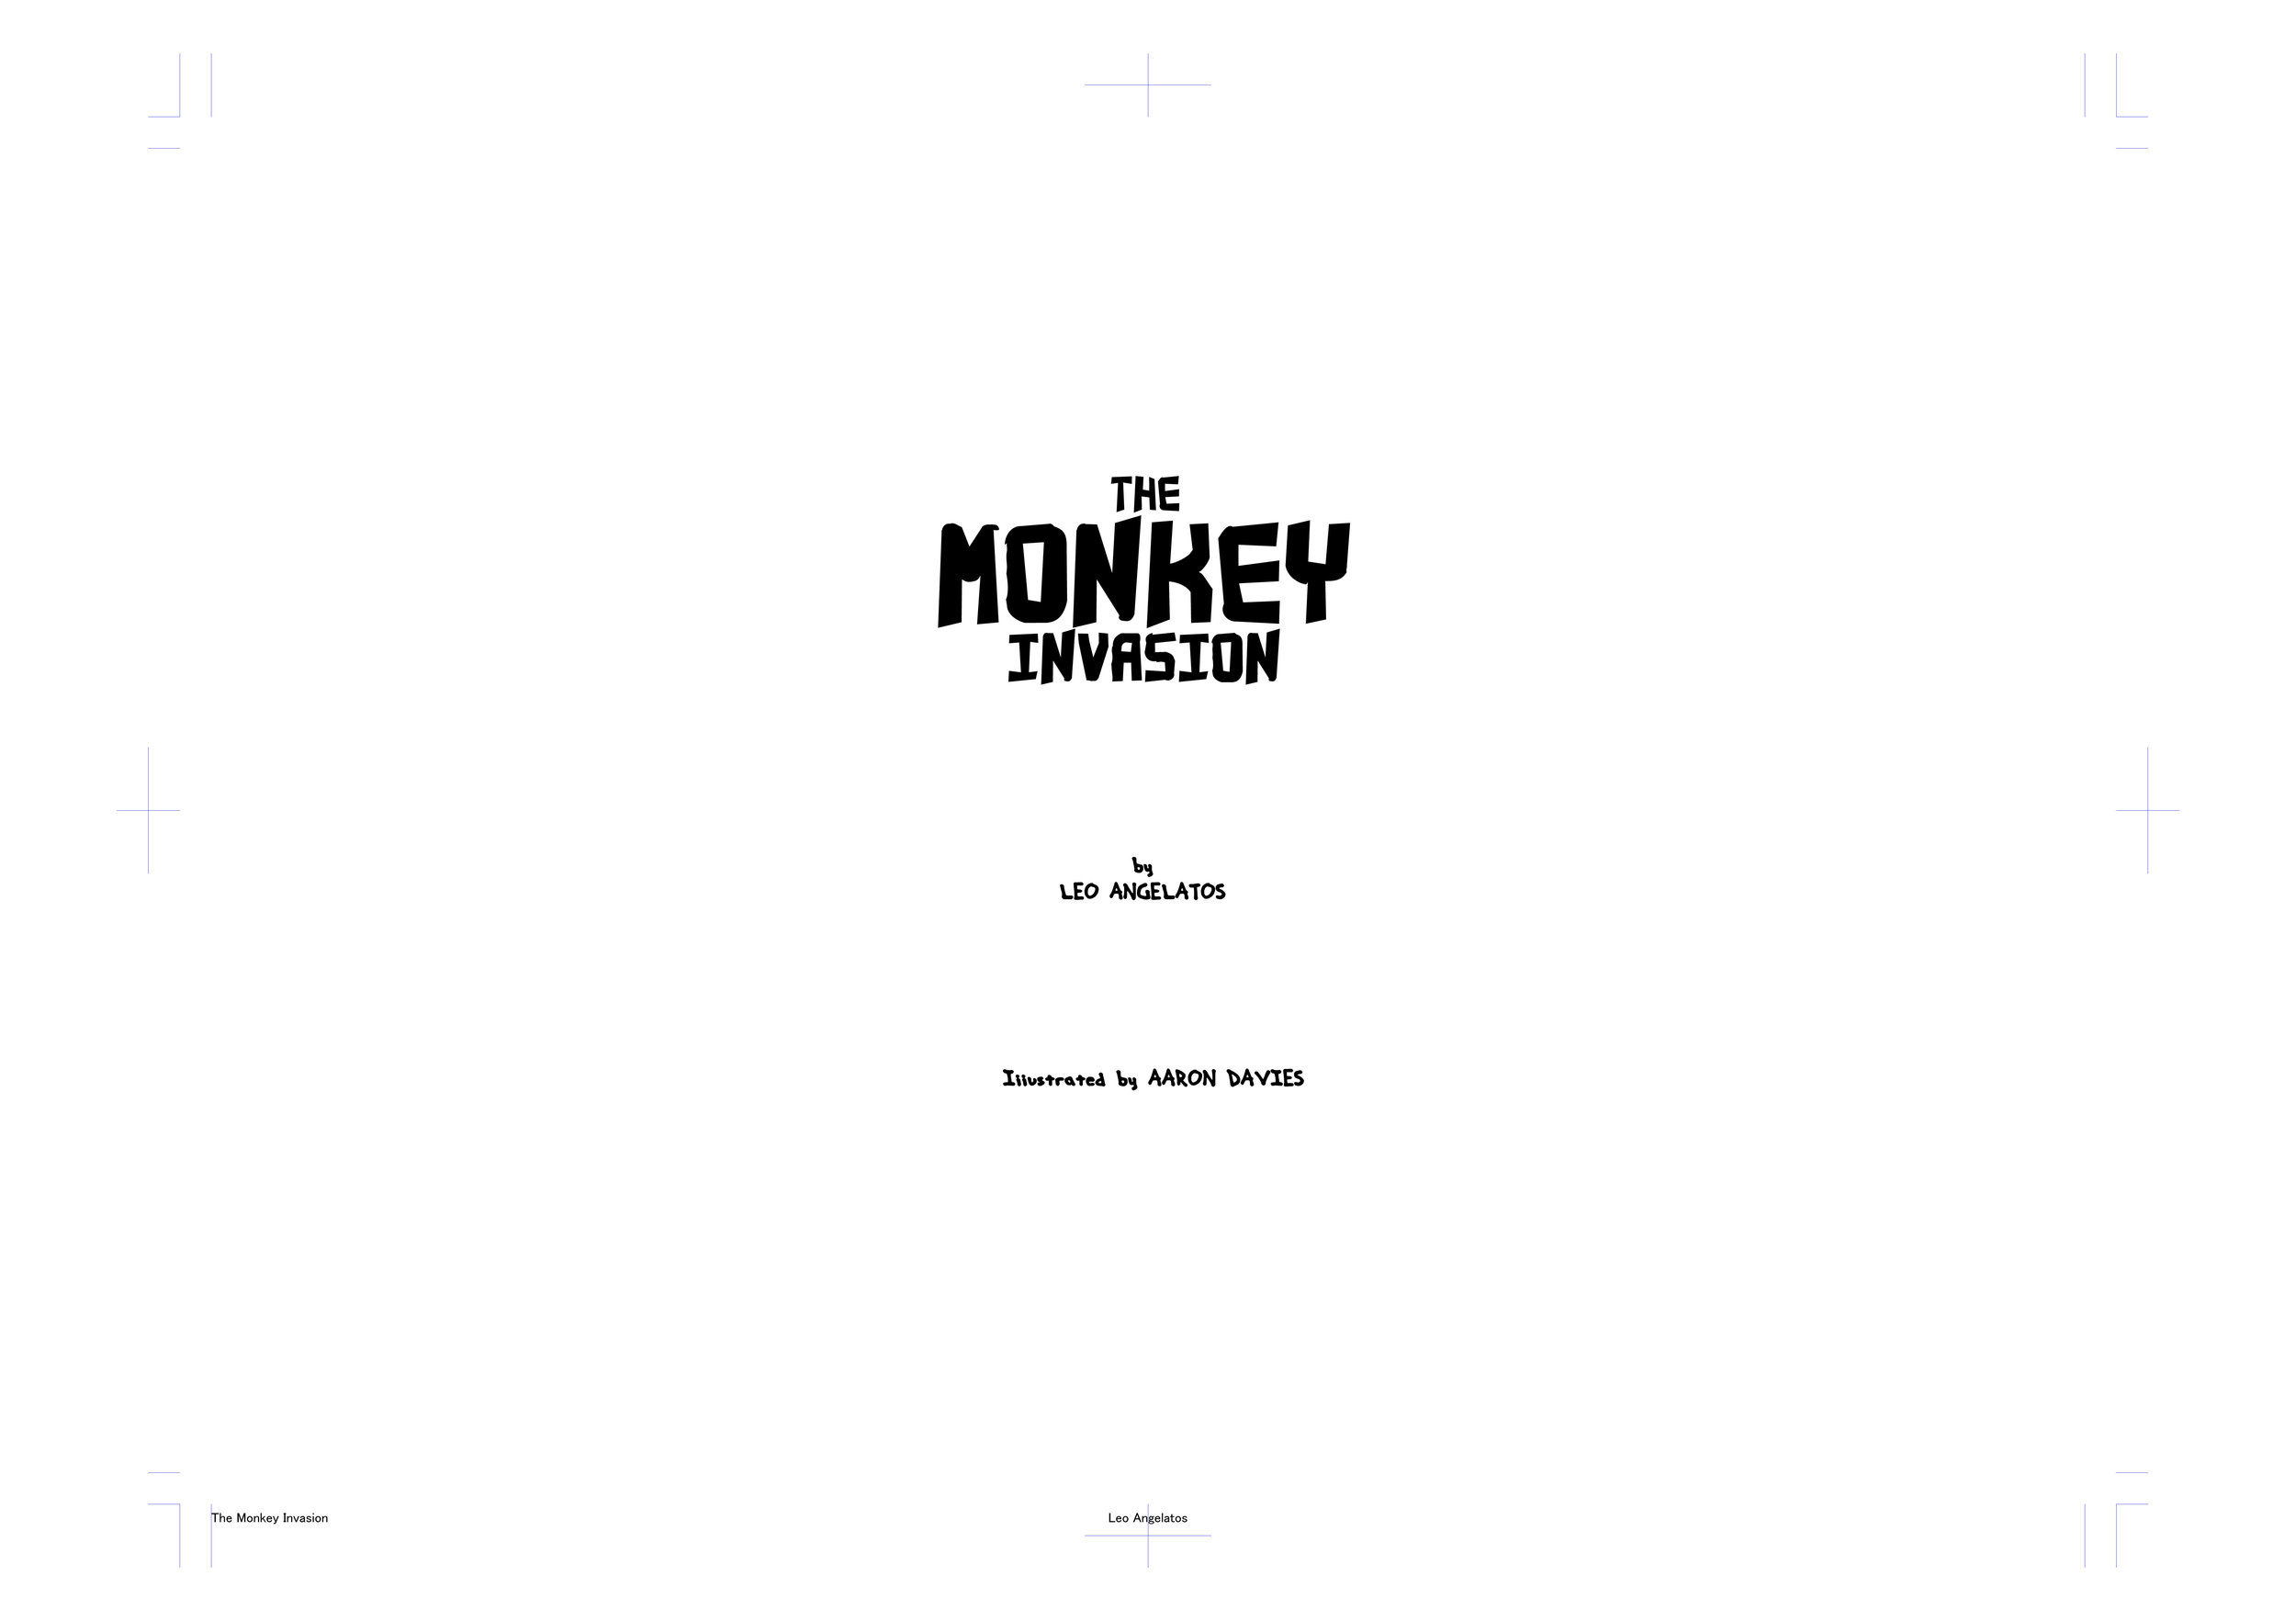 The Monkey Invasion_003.jpg